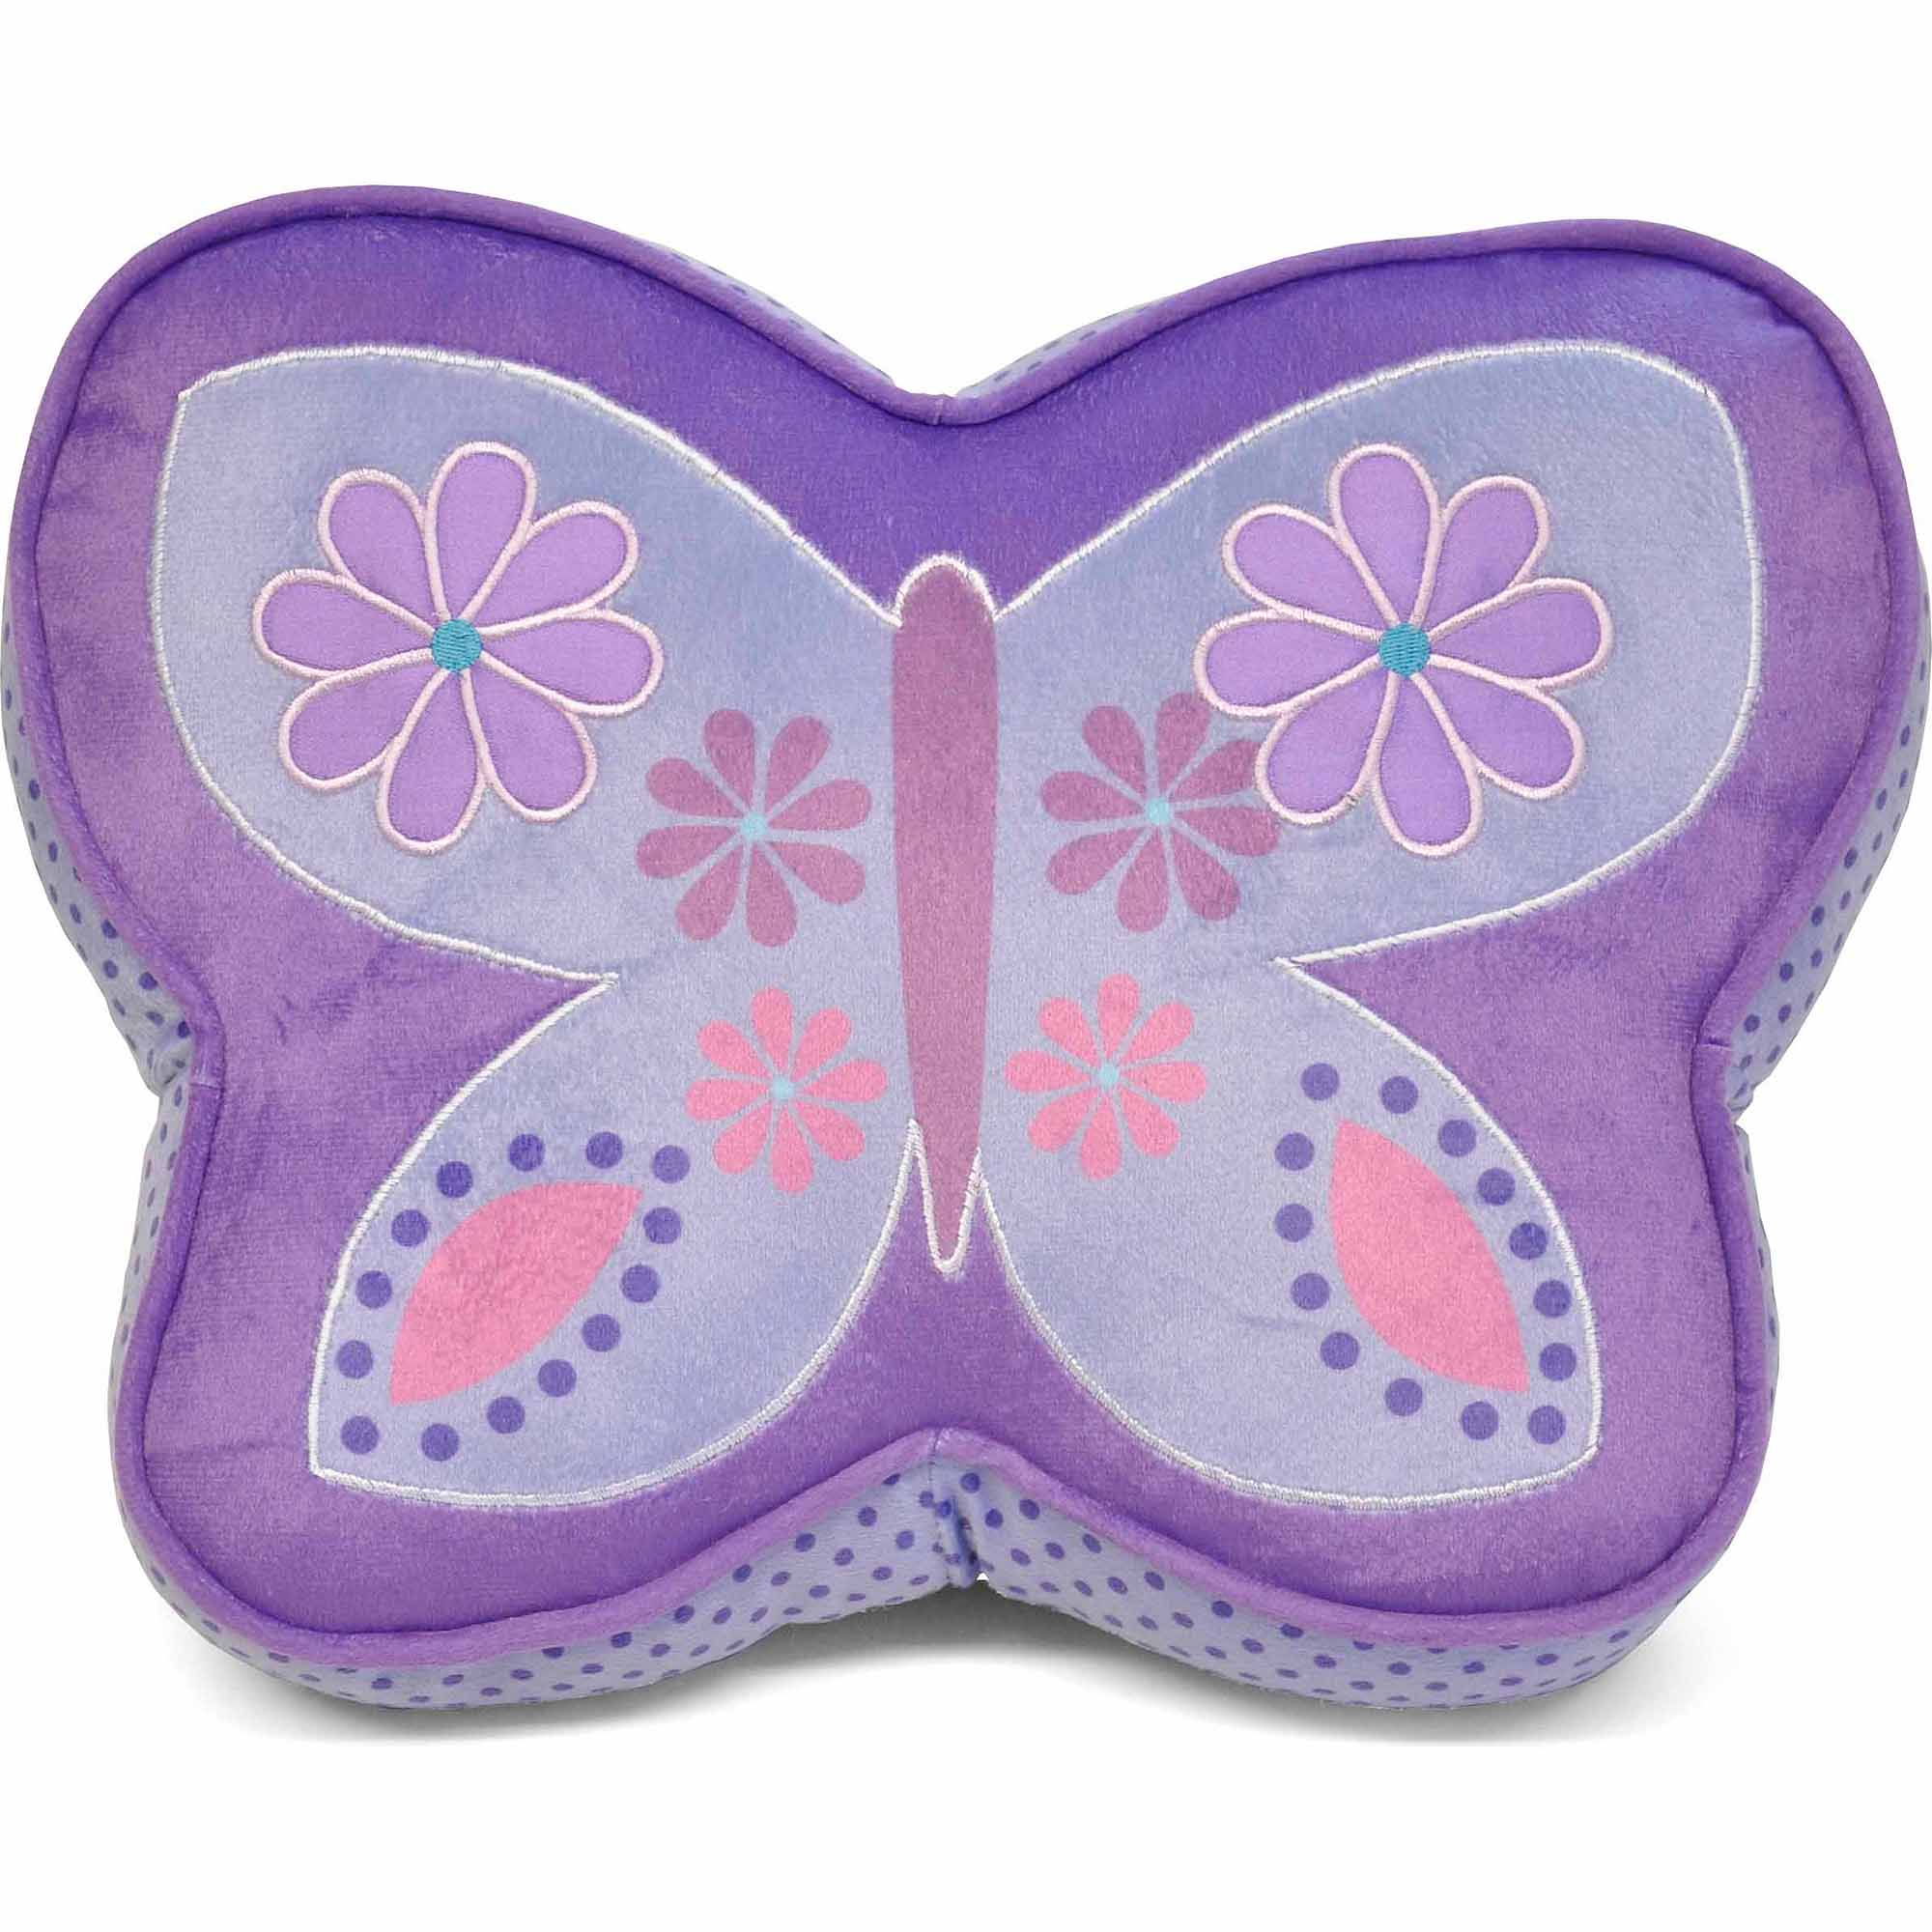 Mainstays Kids Butterfly Decorative Pillow Purple